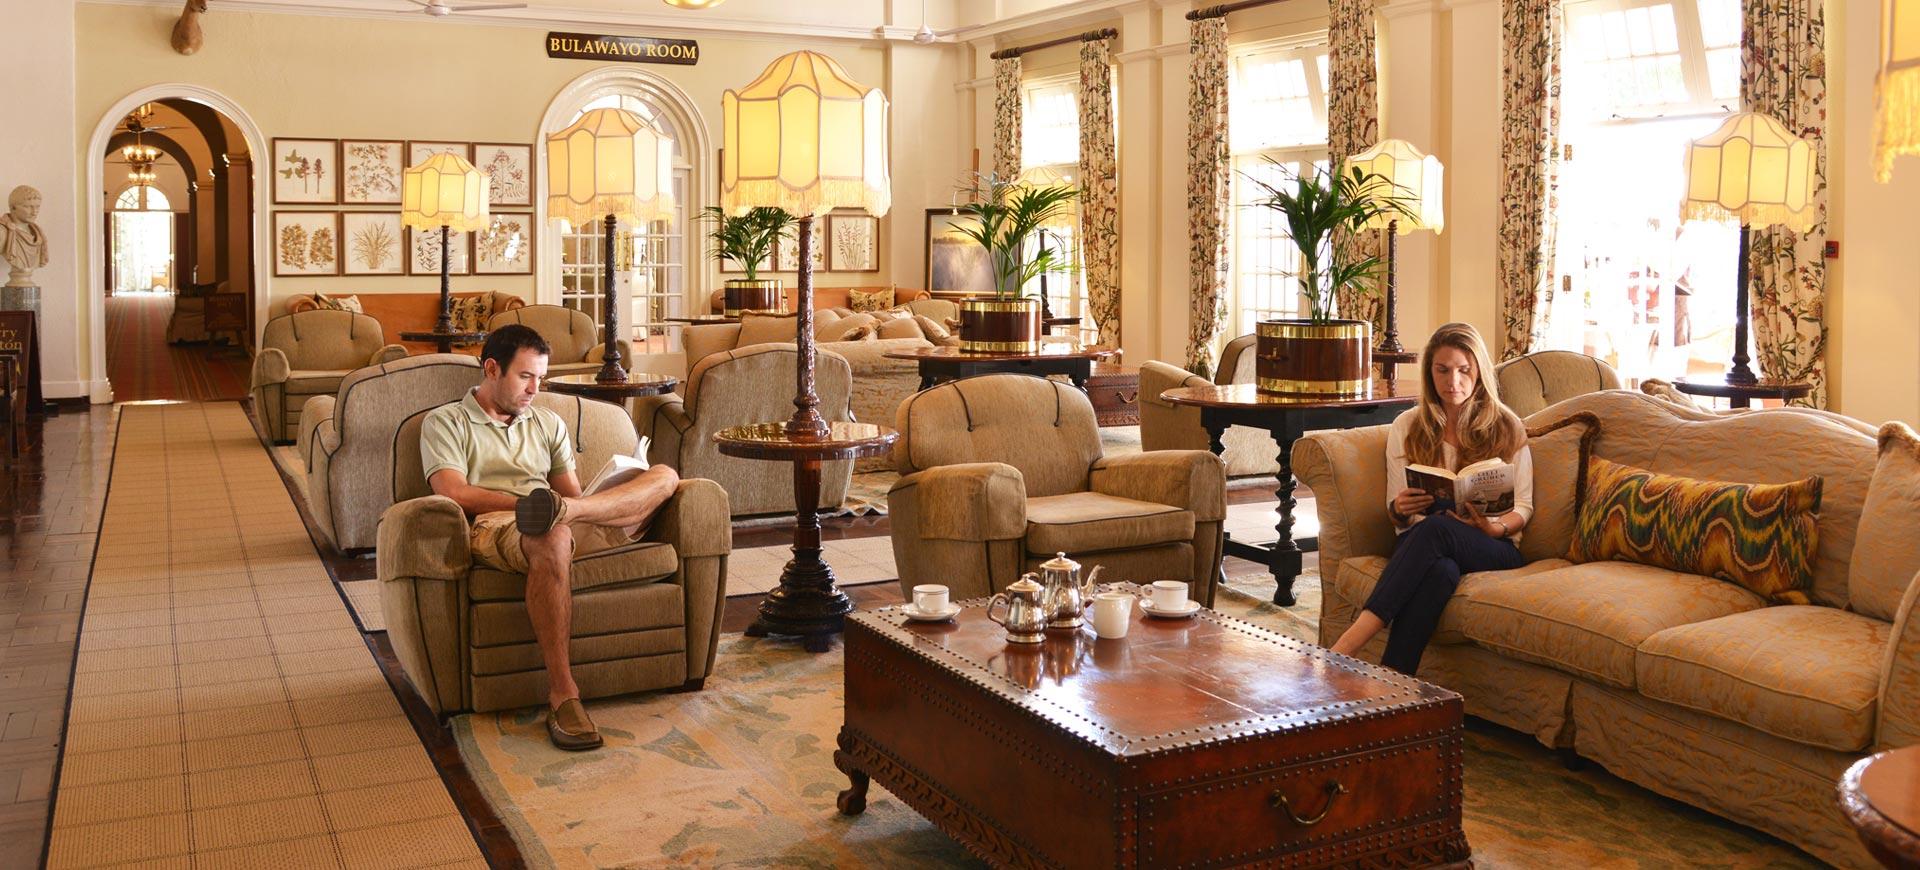 The Victoria Falls Hotel Lounge